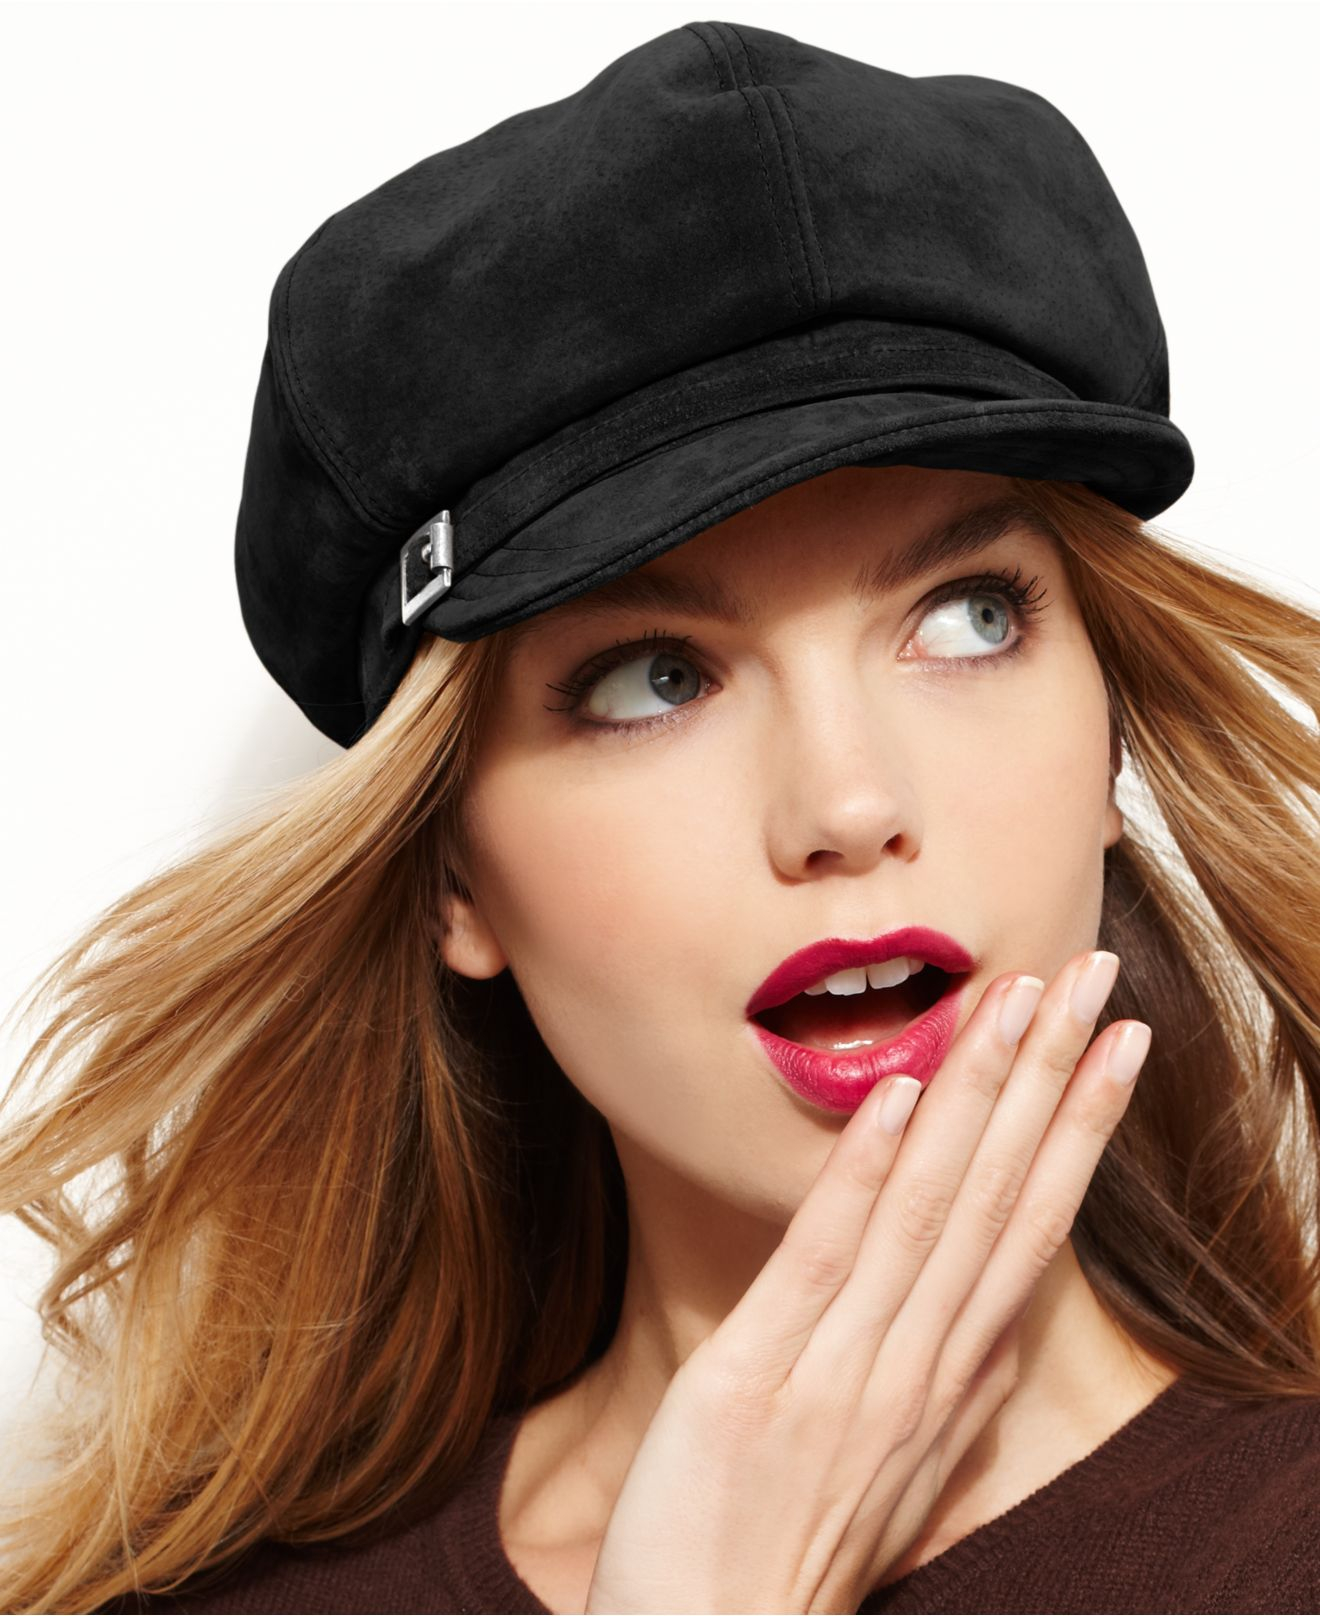 Lyst - Nine West Suede Newsboy Hat in Black 8737cc359579